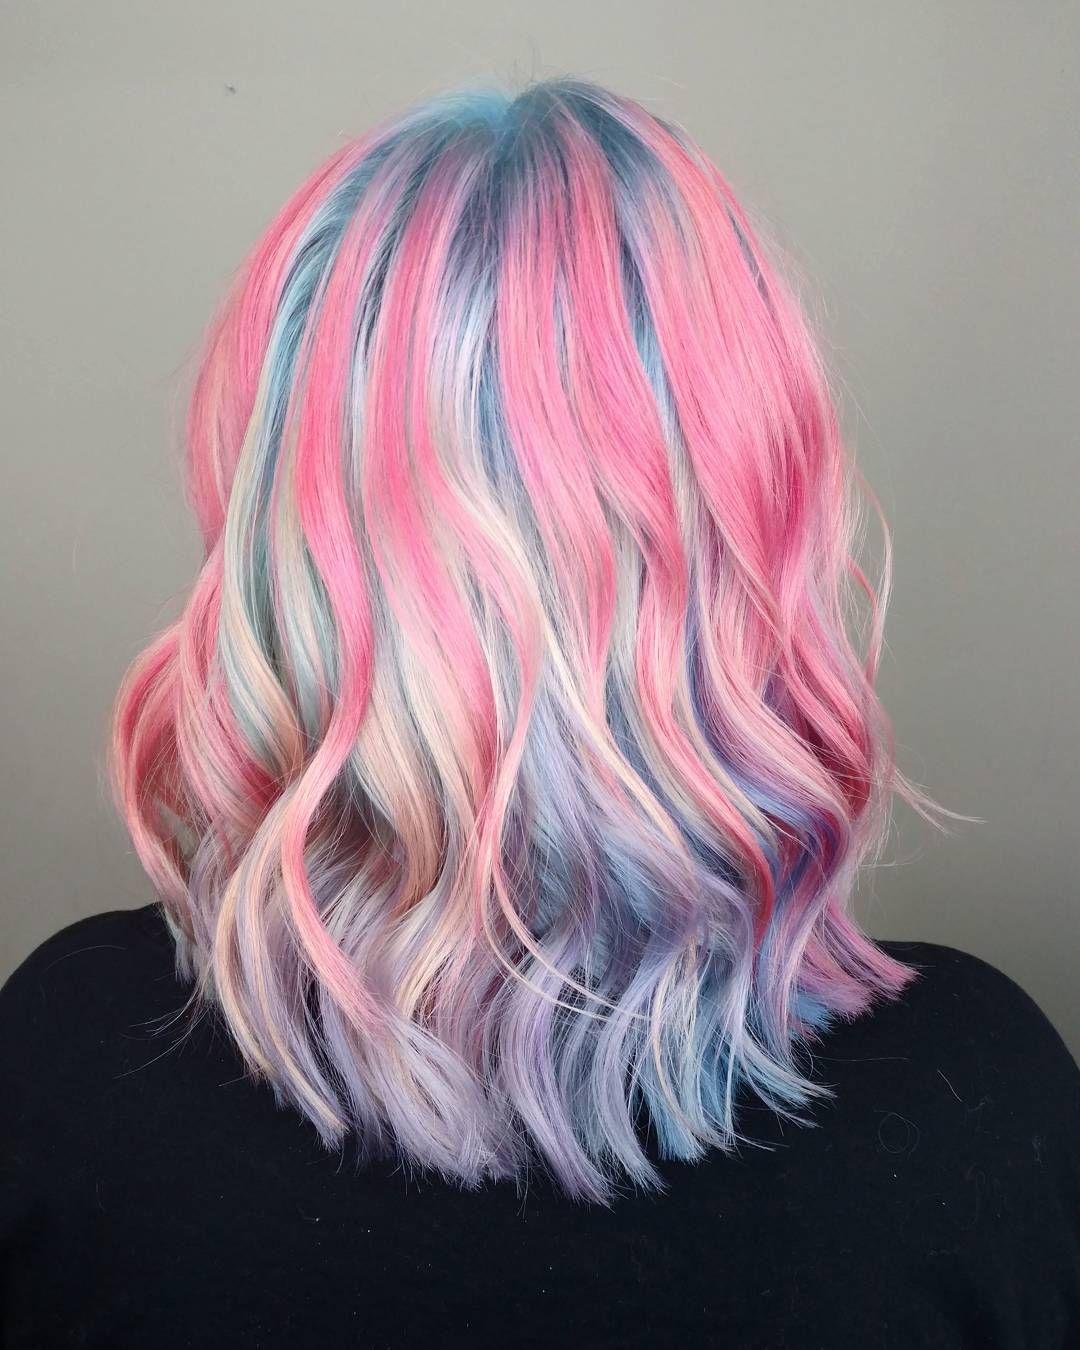 Pin by rachel on cool hair pinterest colourful hair hair